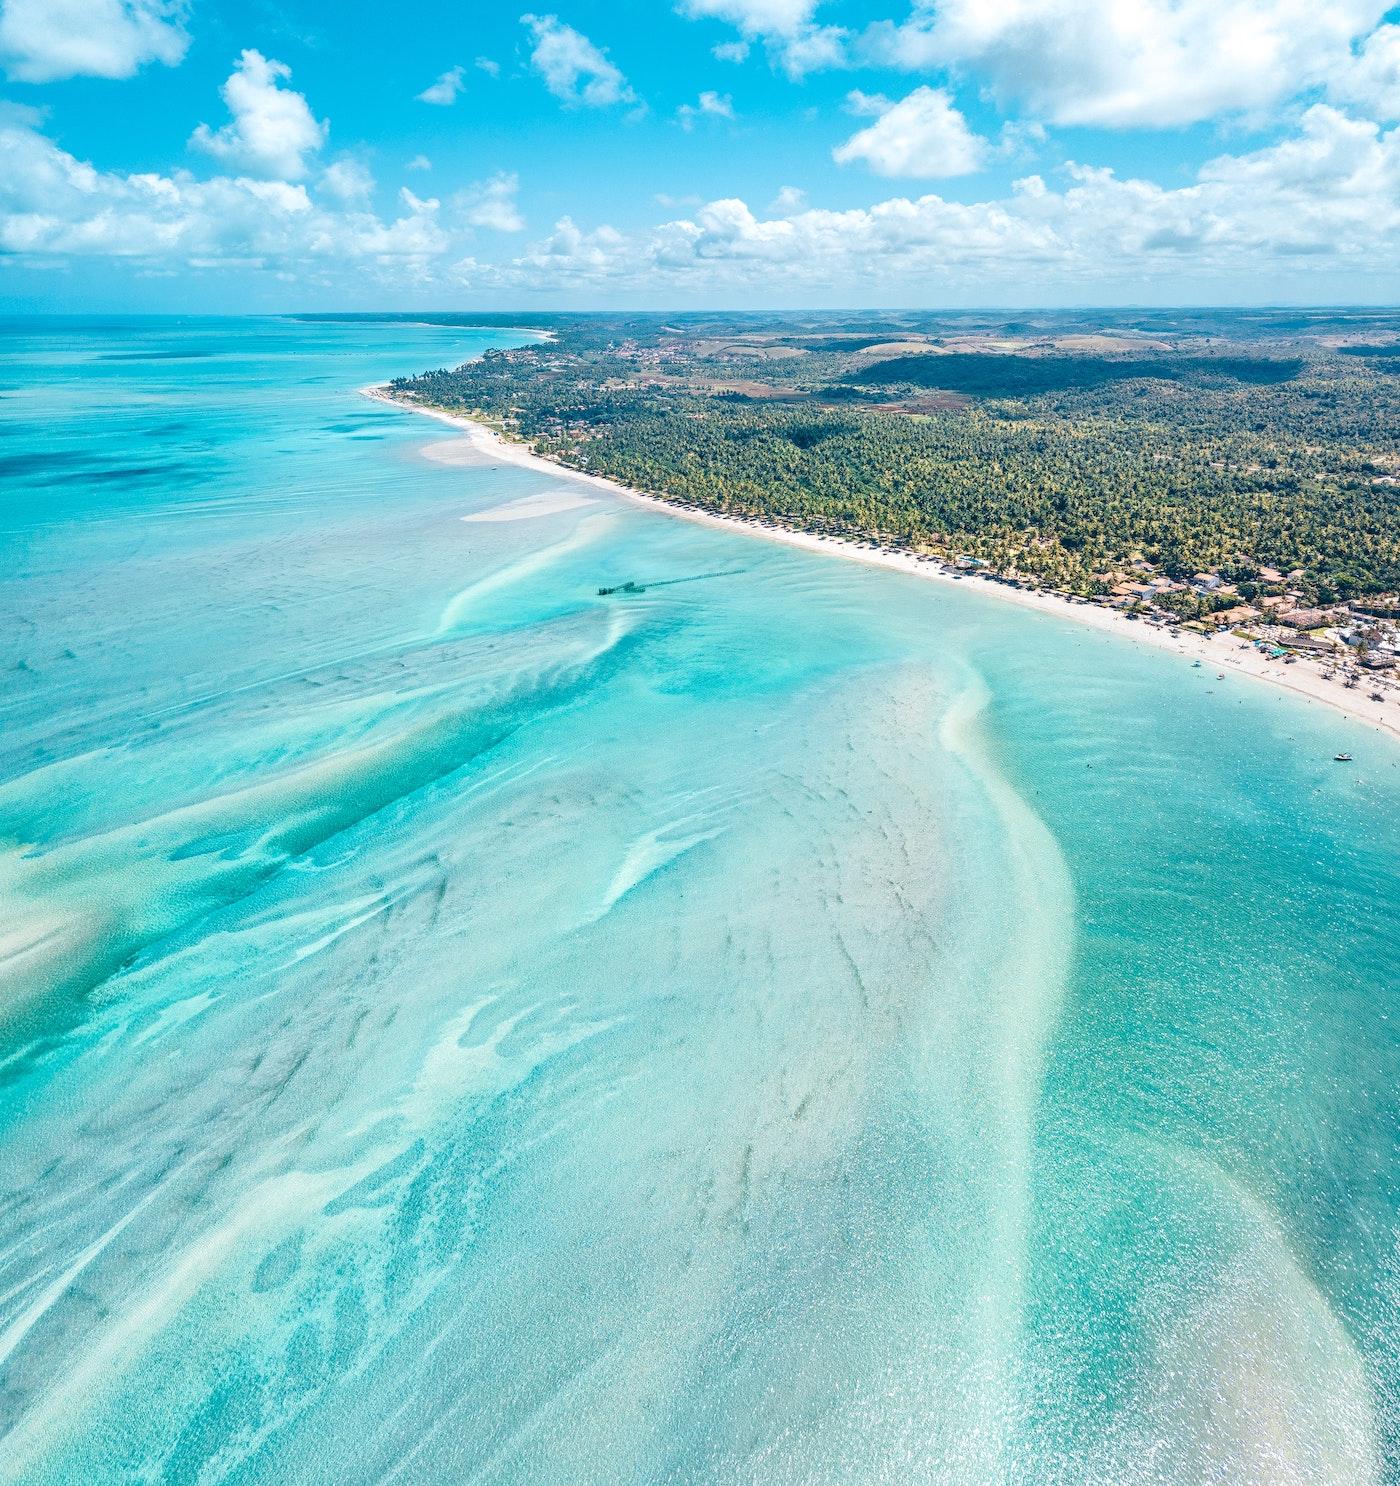 Karibik Strand Aruba Beach Caribbean